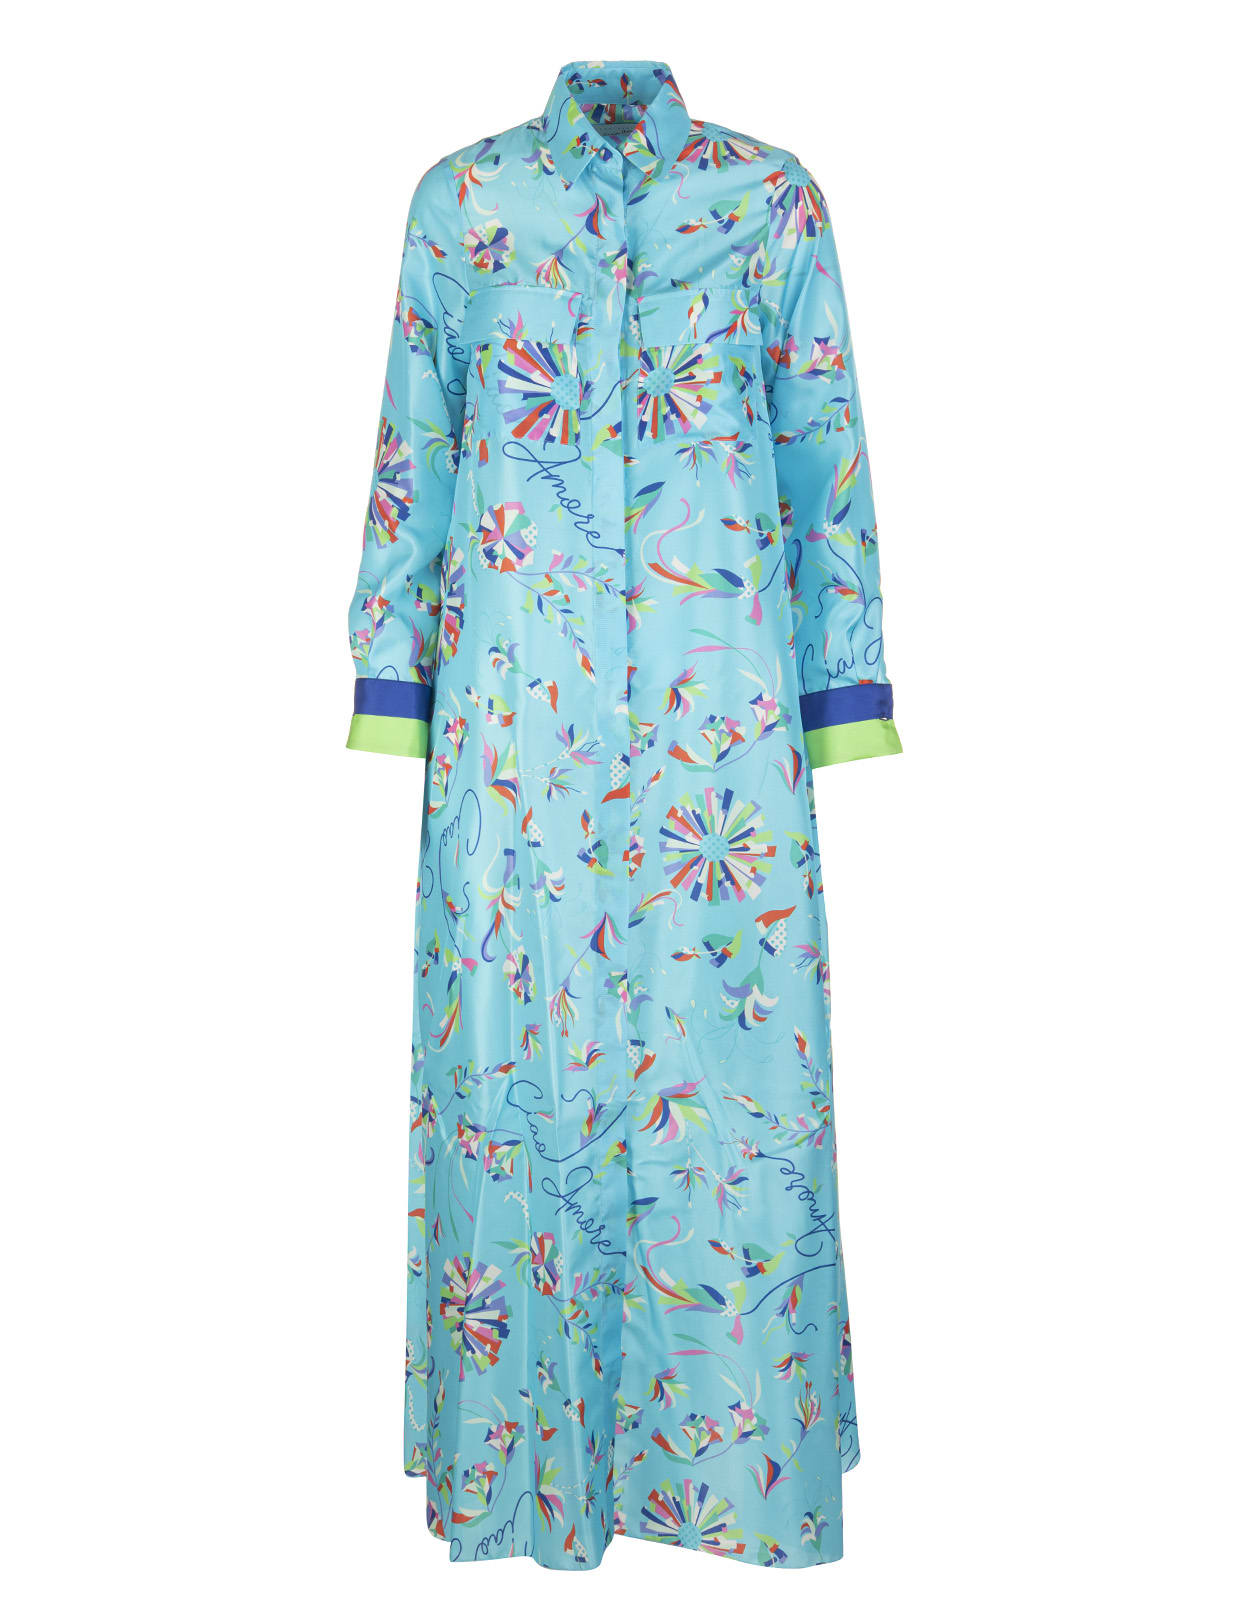 Printed Long Chemisier Dress With V-neck